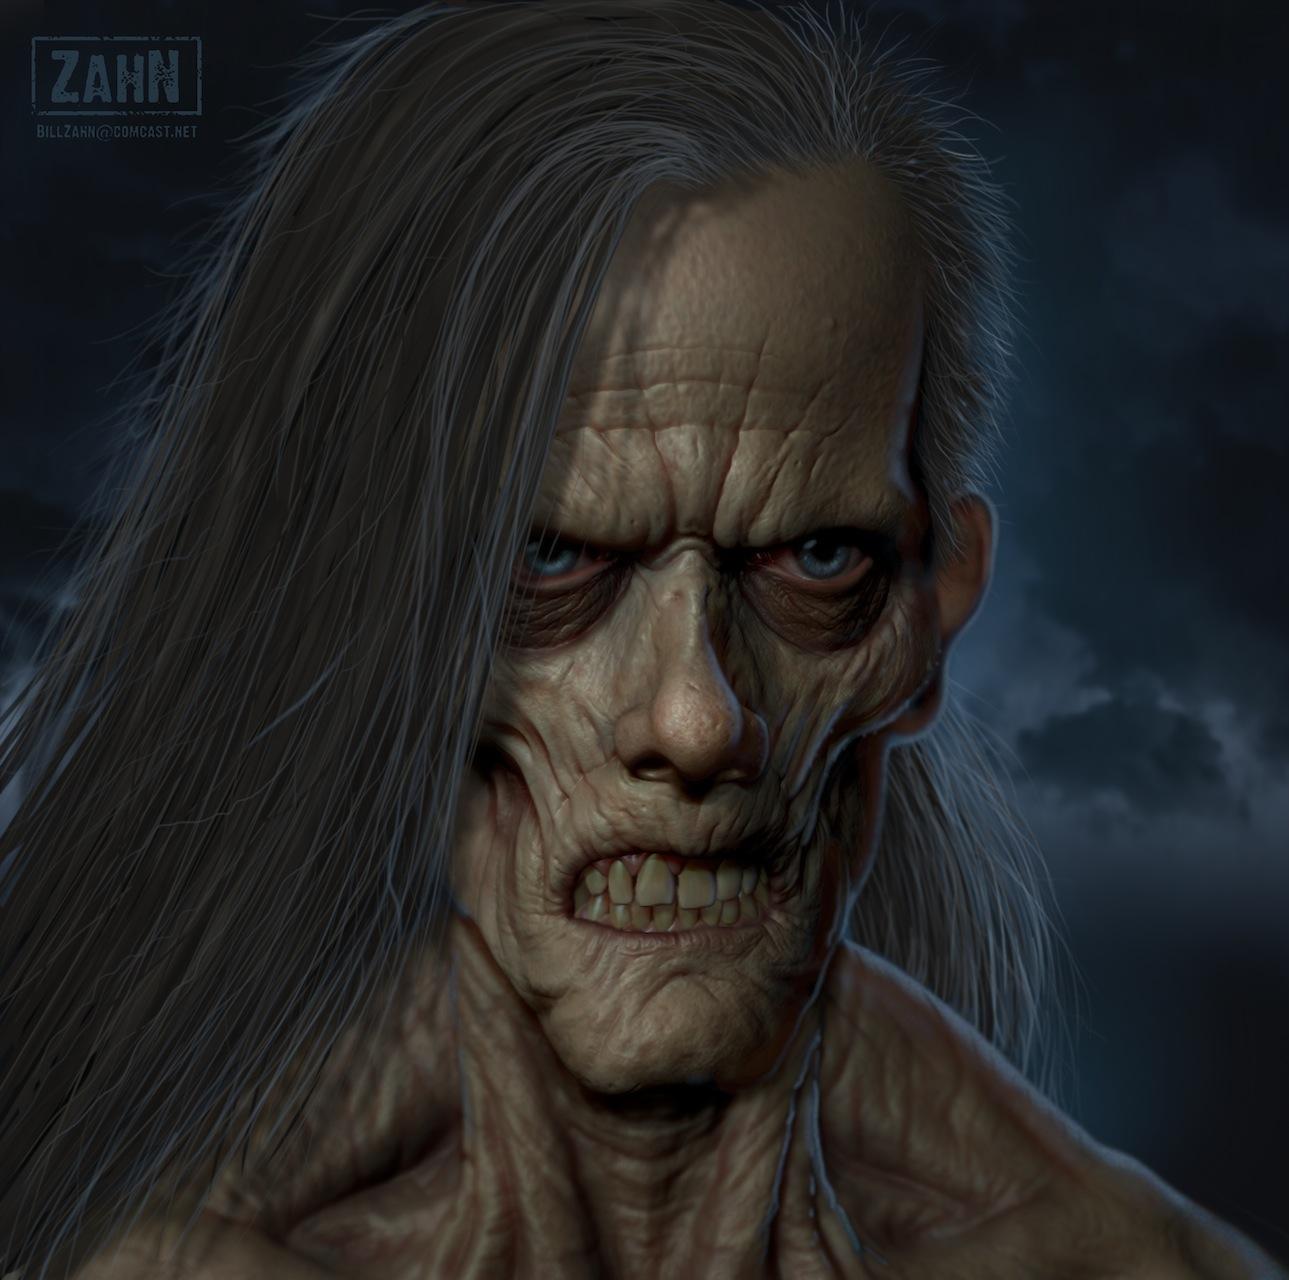 The Creature, by Bill Zahn